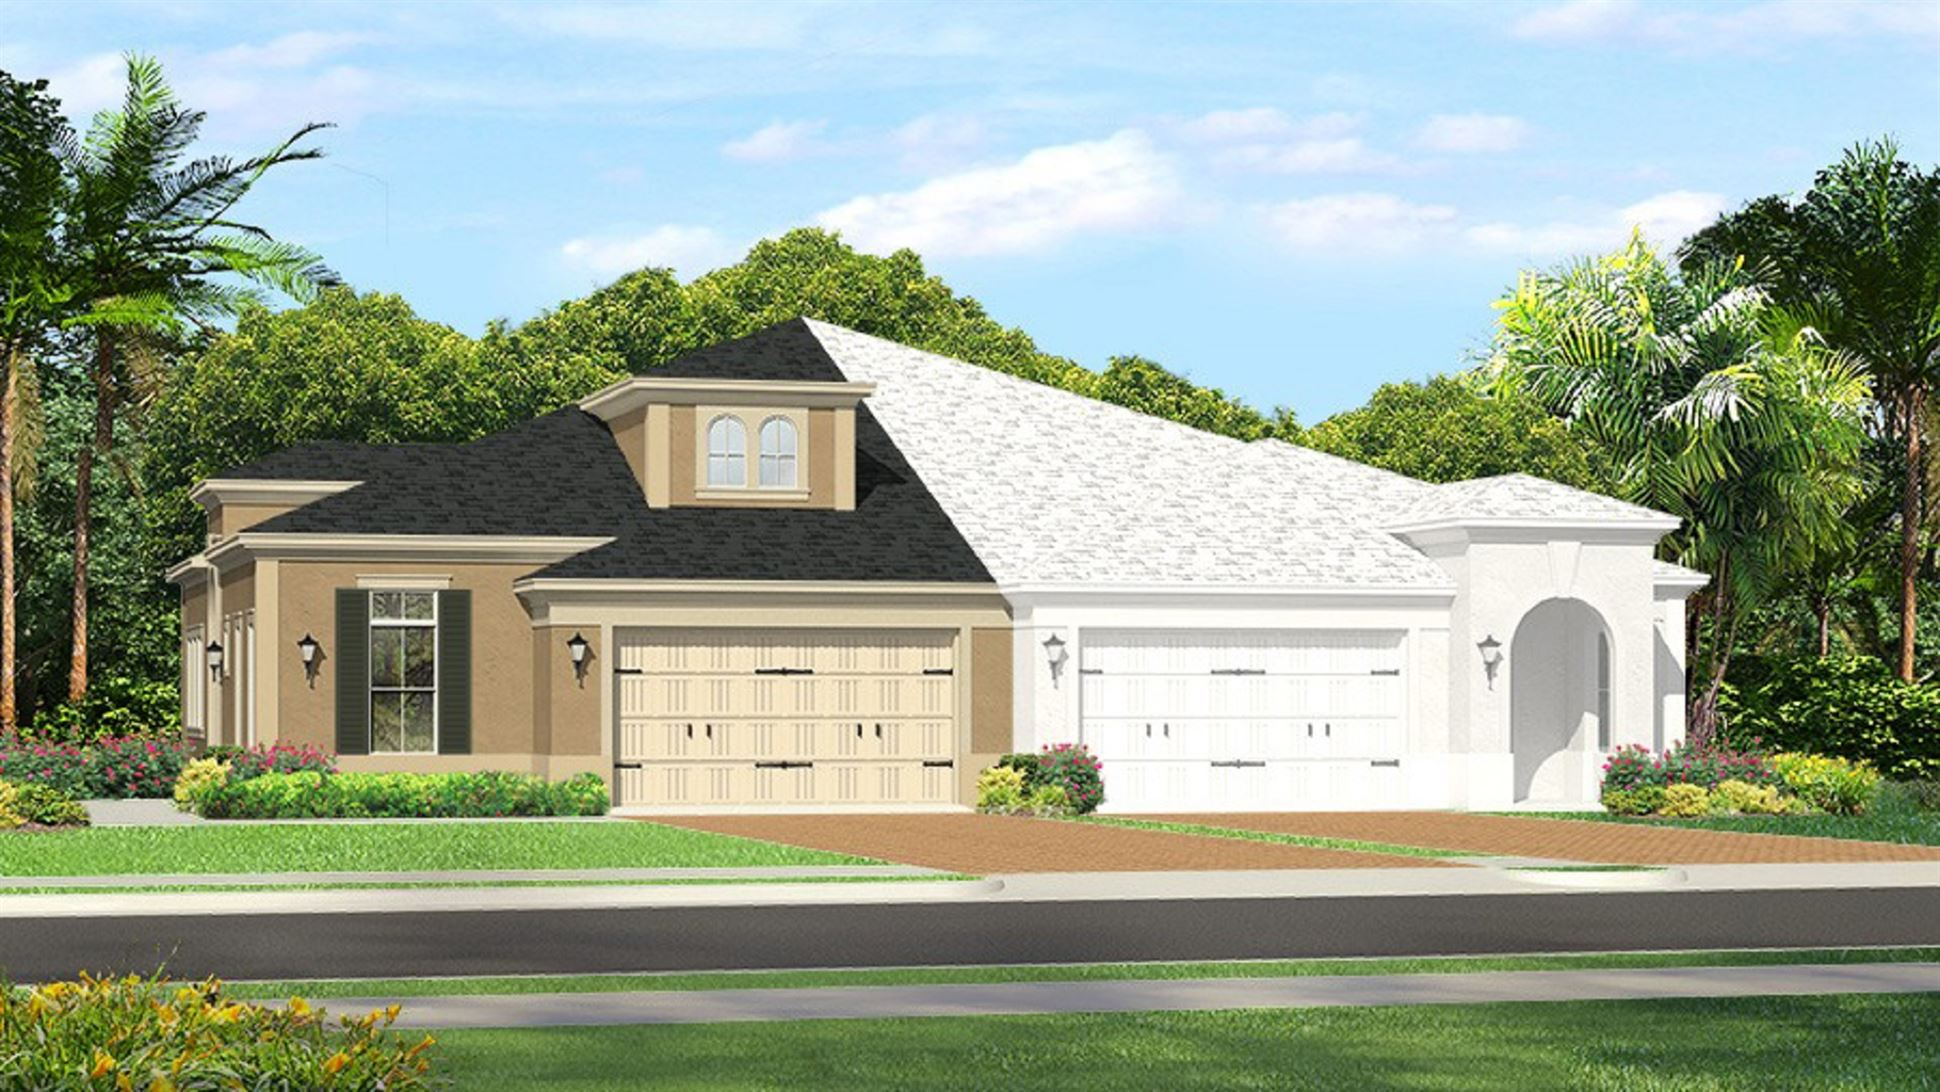 Arbor Grande Lakewood Ranch Florida Real Estate | Lakewood Ranch Realtor | New Homes Communities